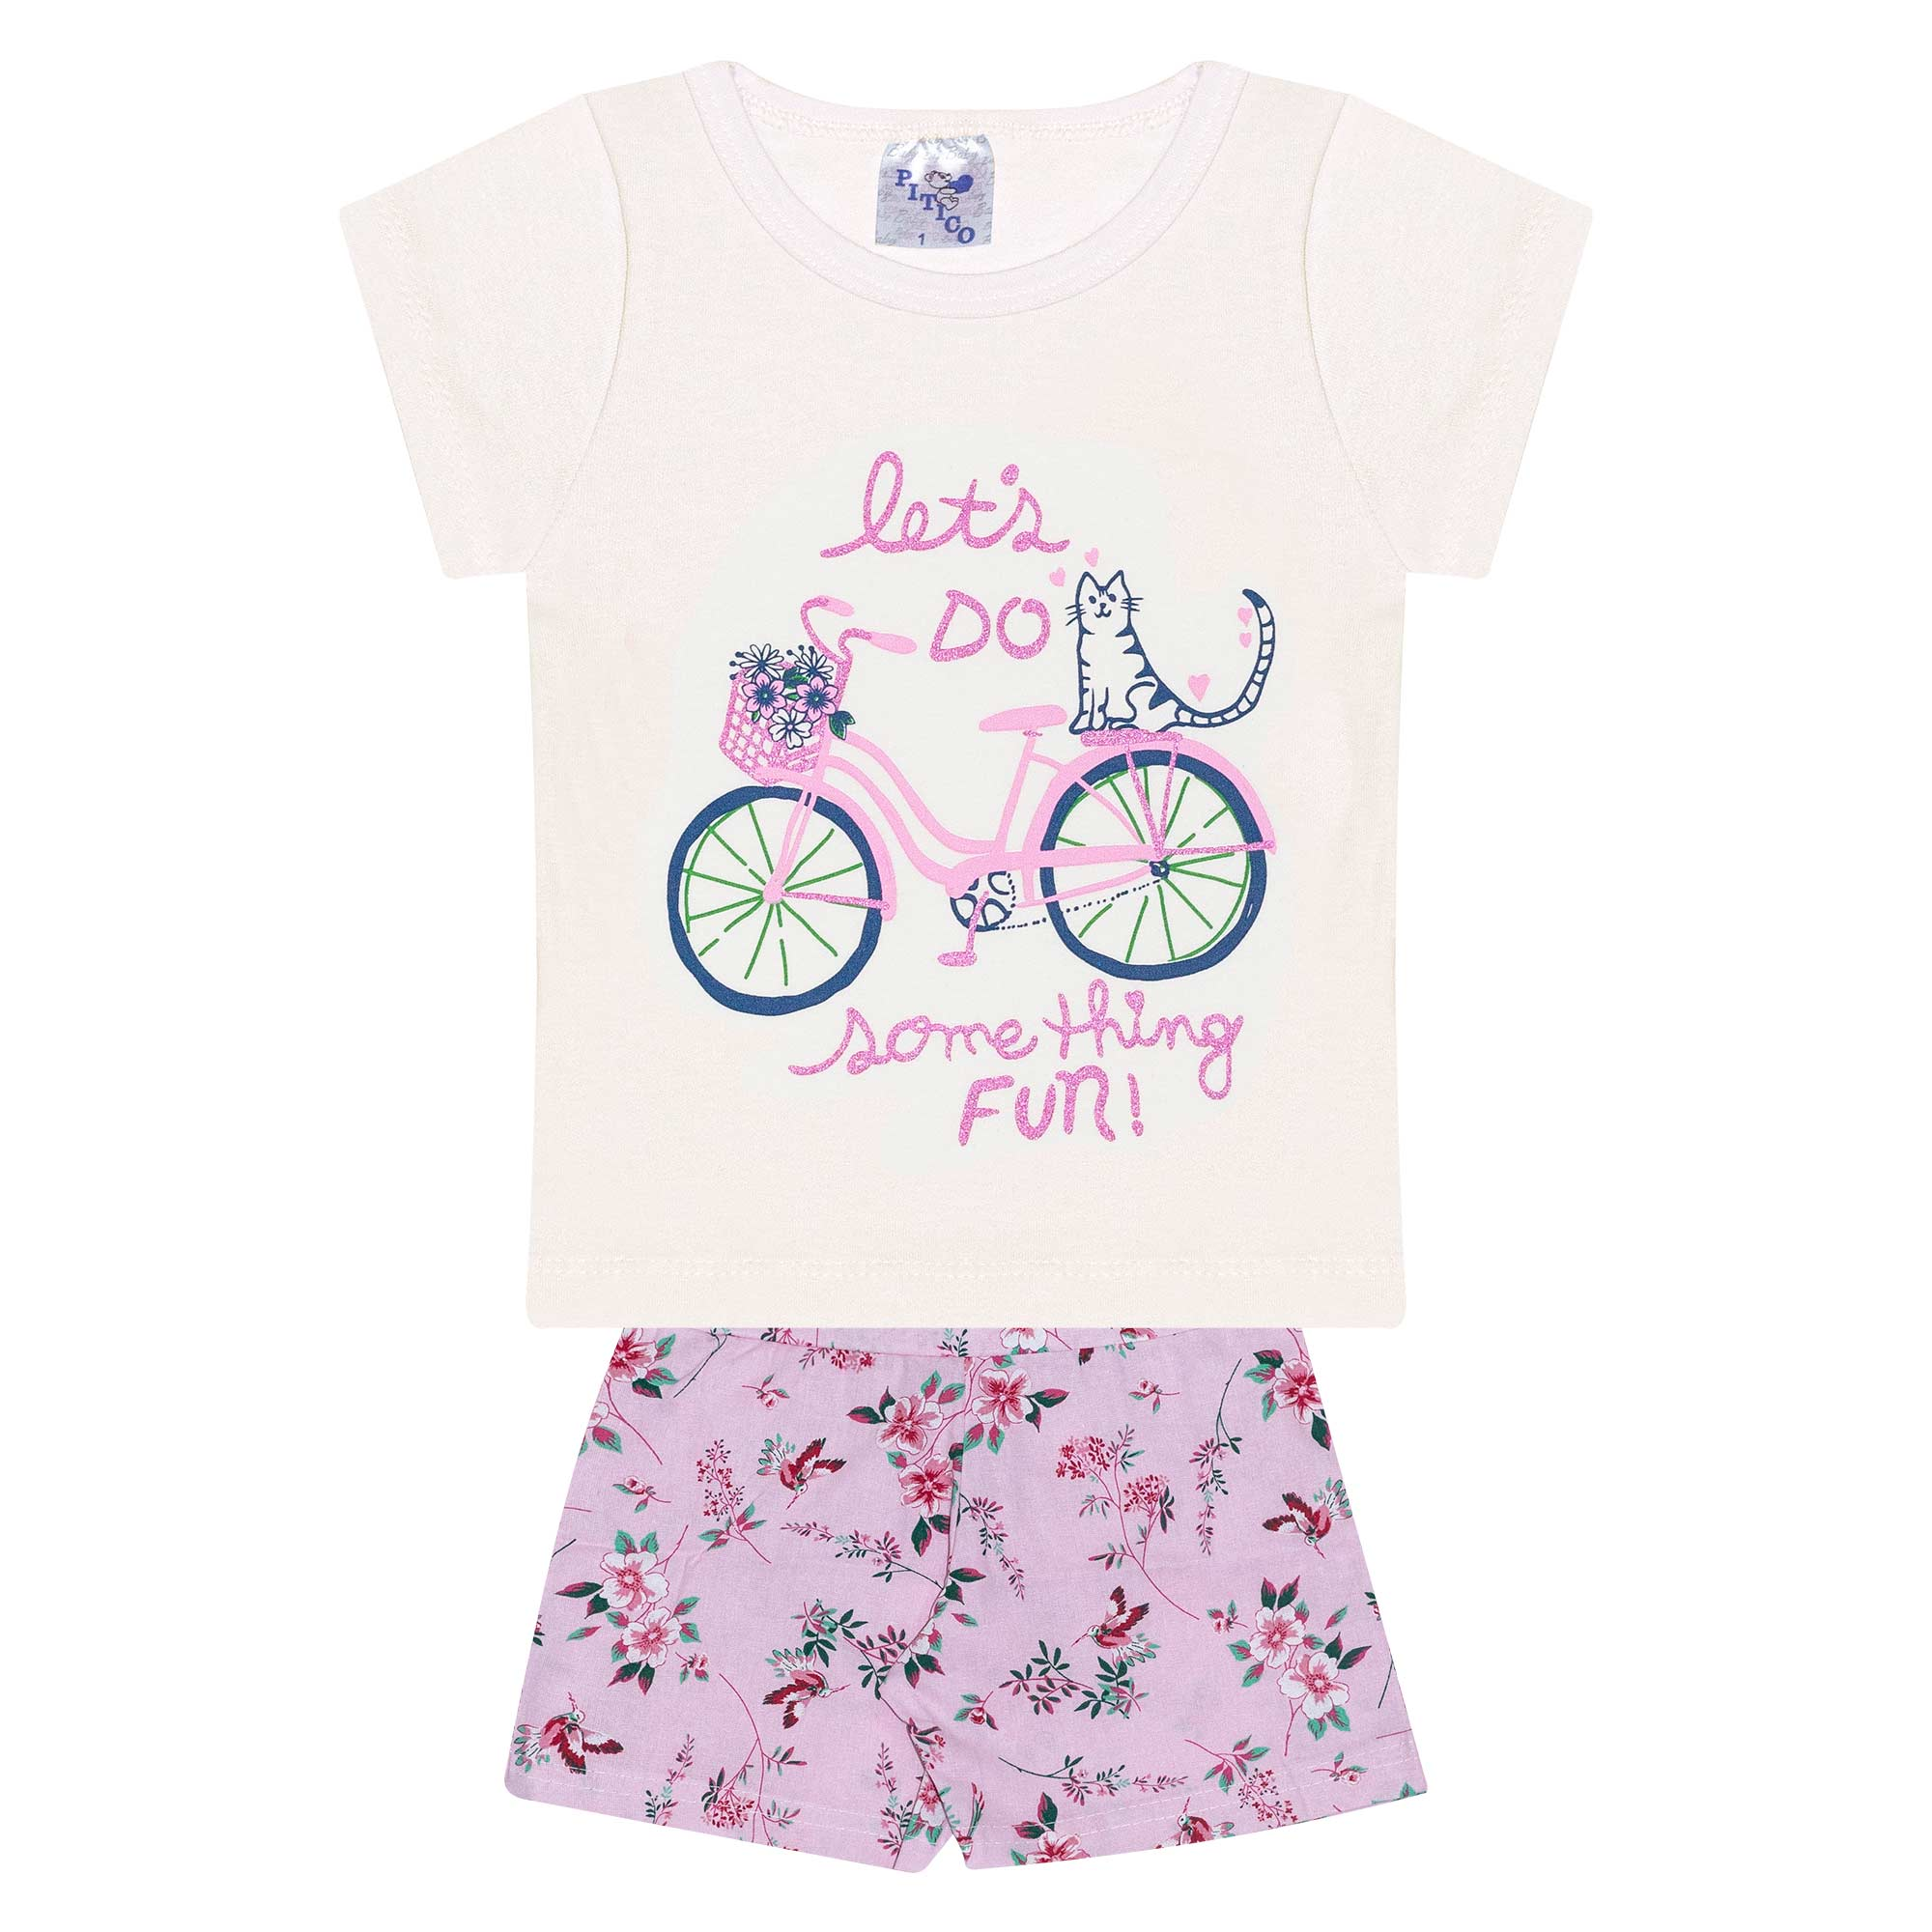 Conjunto Infantil Feminino - Ref 1009 - Pérola/Rosa - Pitico